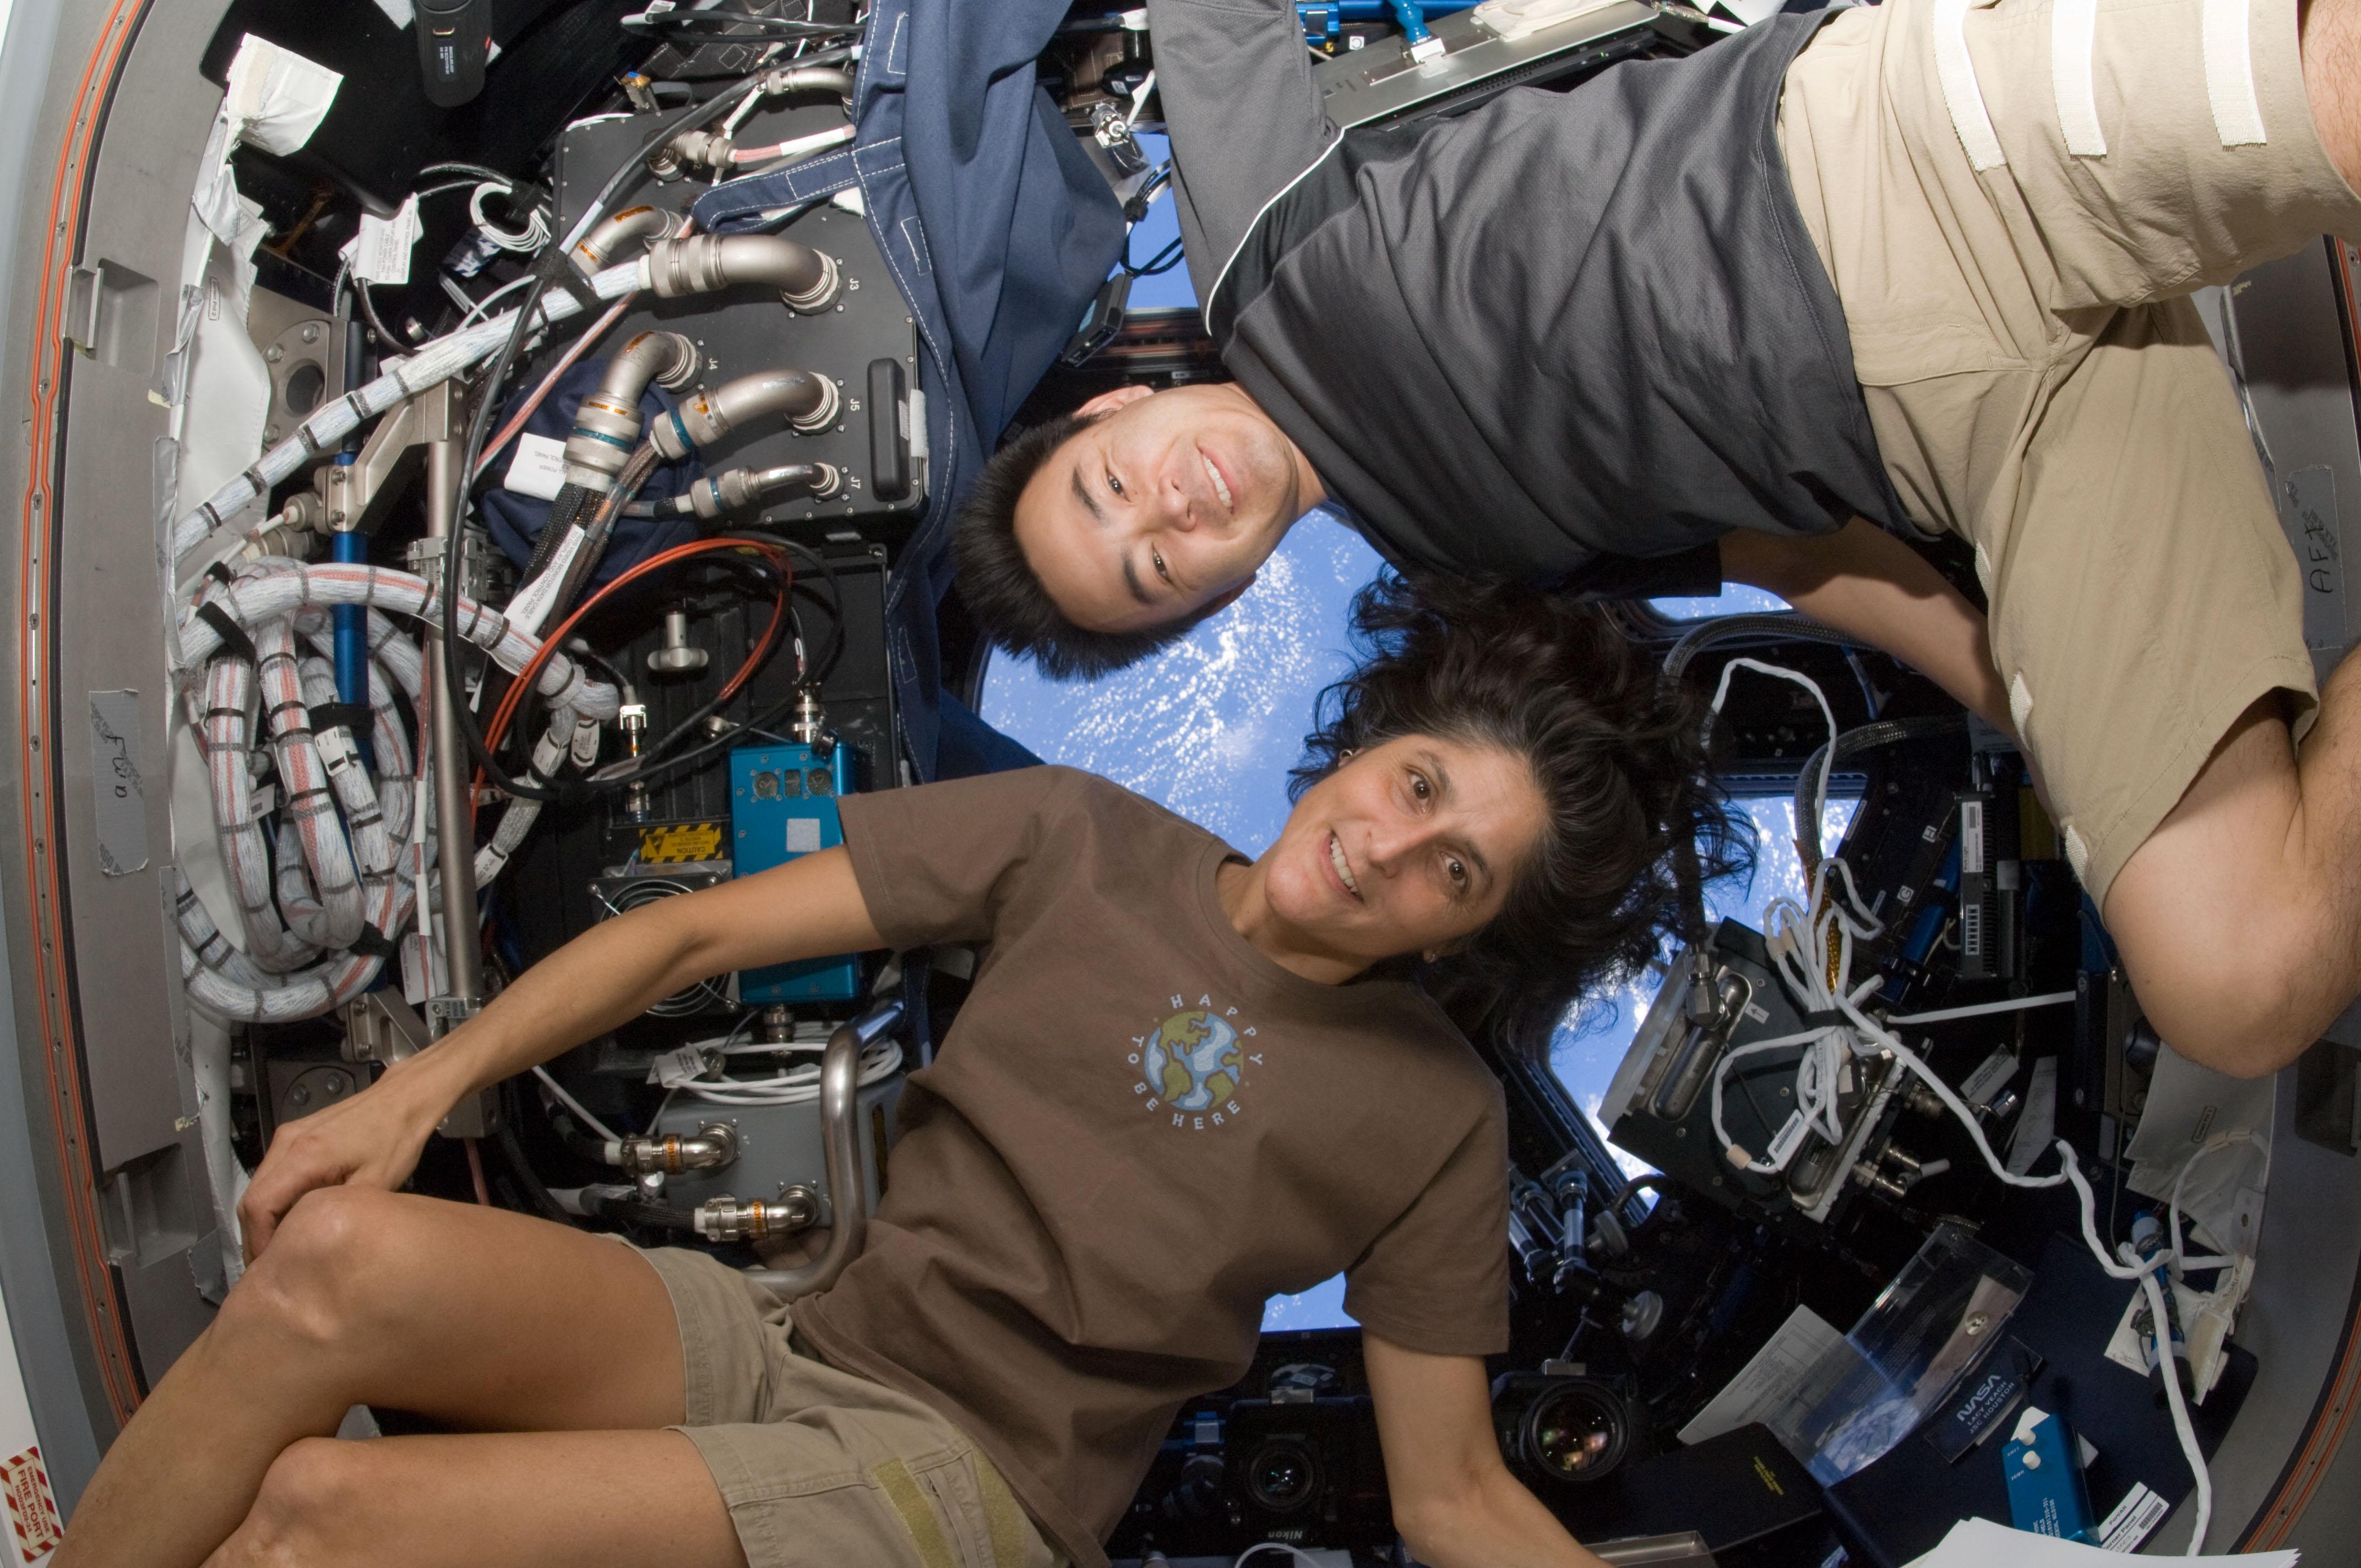 Strange But True: Astronauts Get Taller in Space